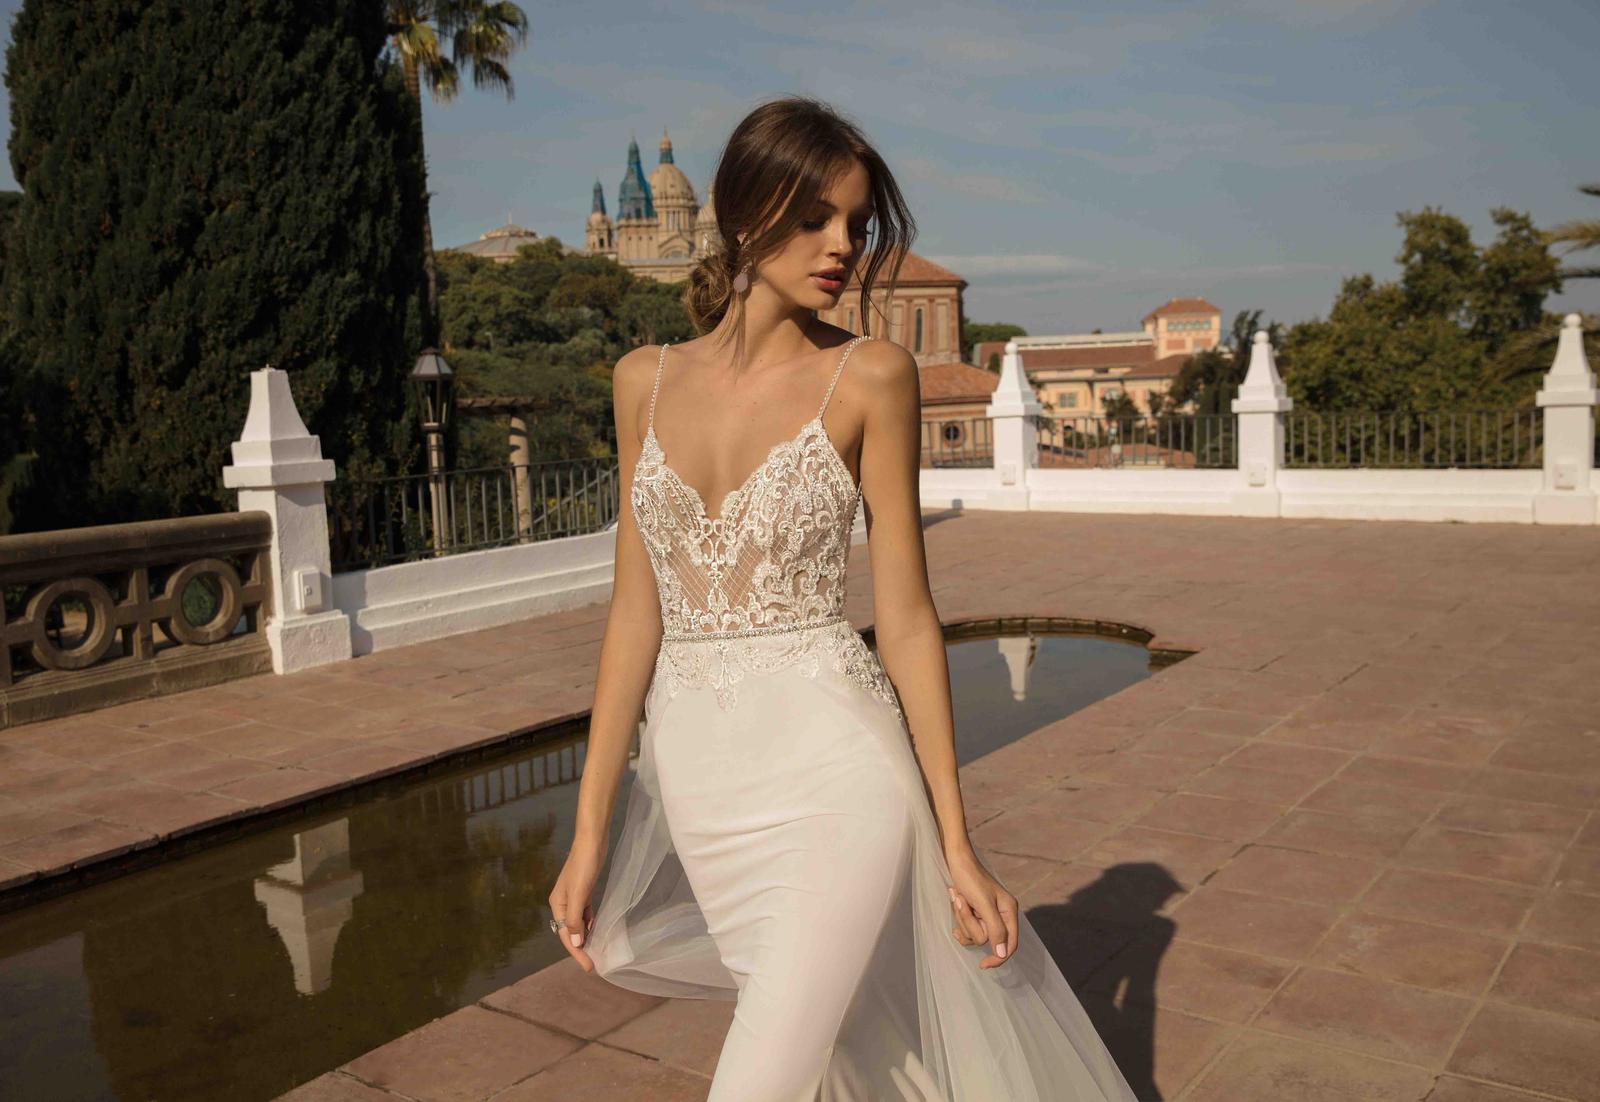 Muse by Berta * Svadobné šaty z kolekcií na rok 2019 - Obrázok č. 5